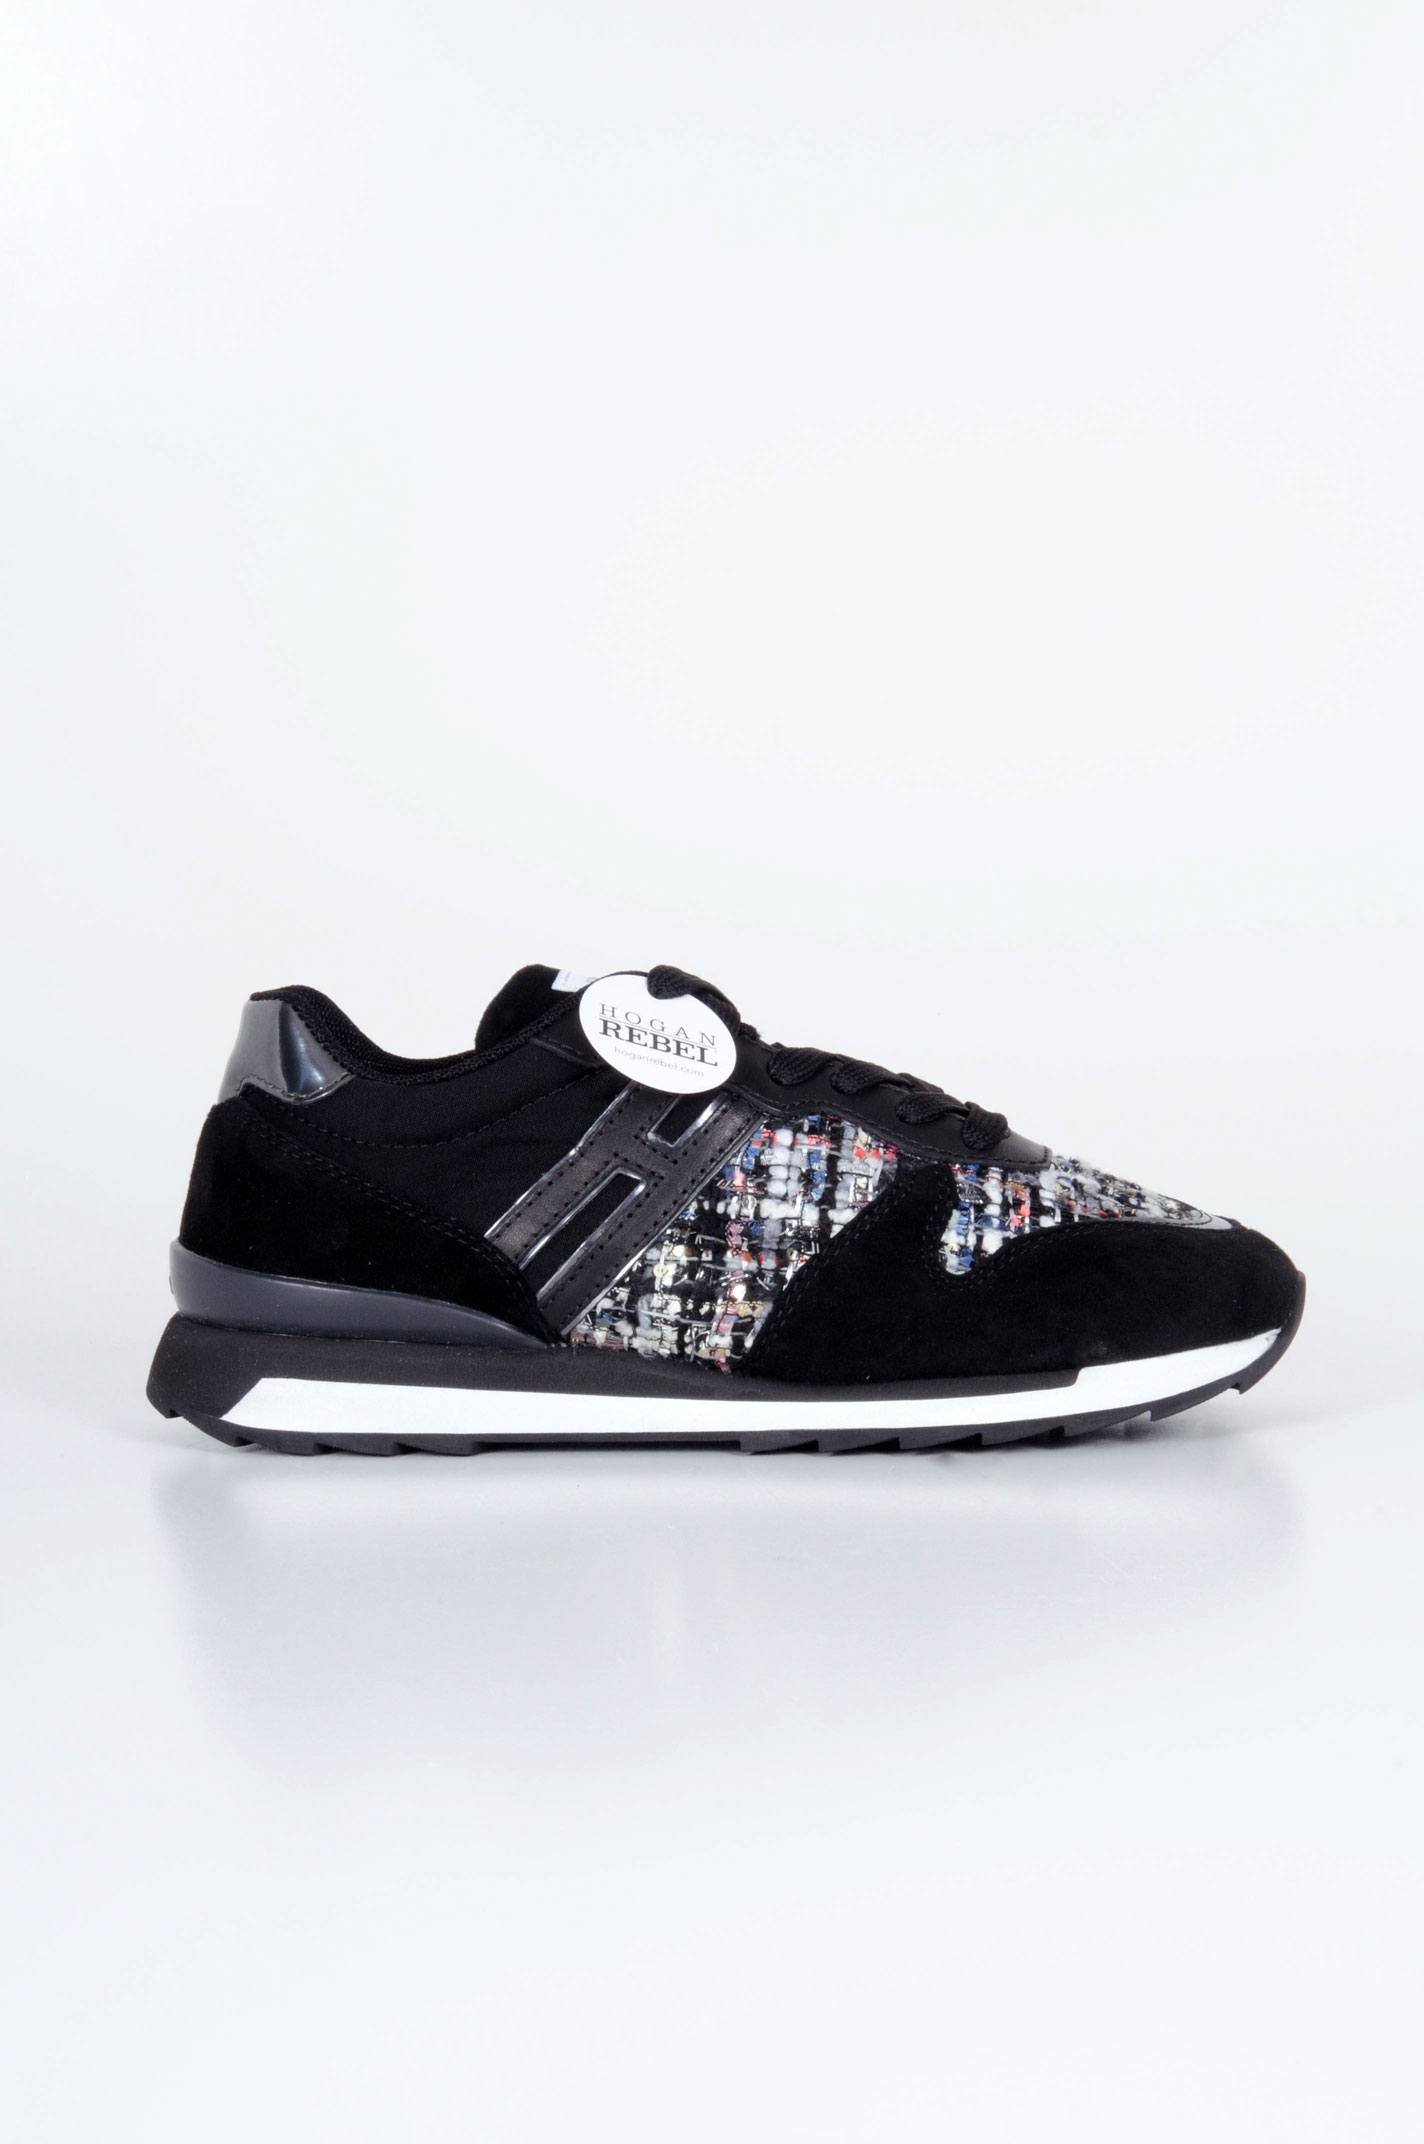 5e4006af96812 Sneaker R261 donna  Acquista Online